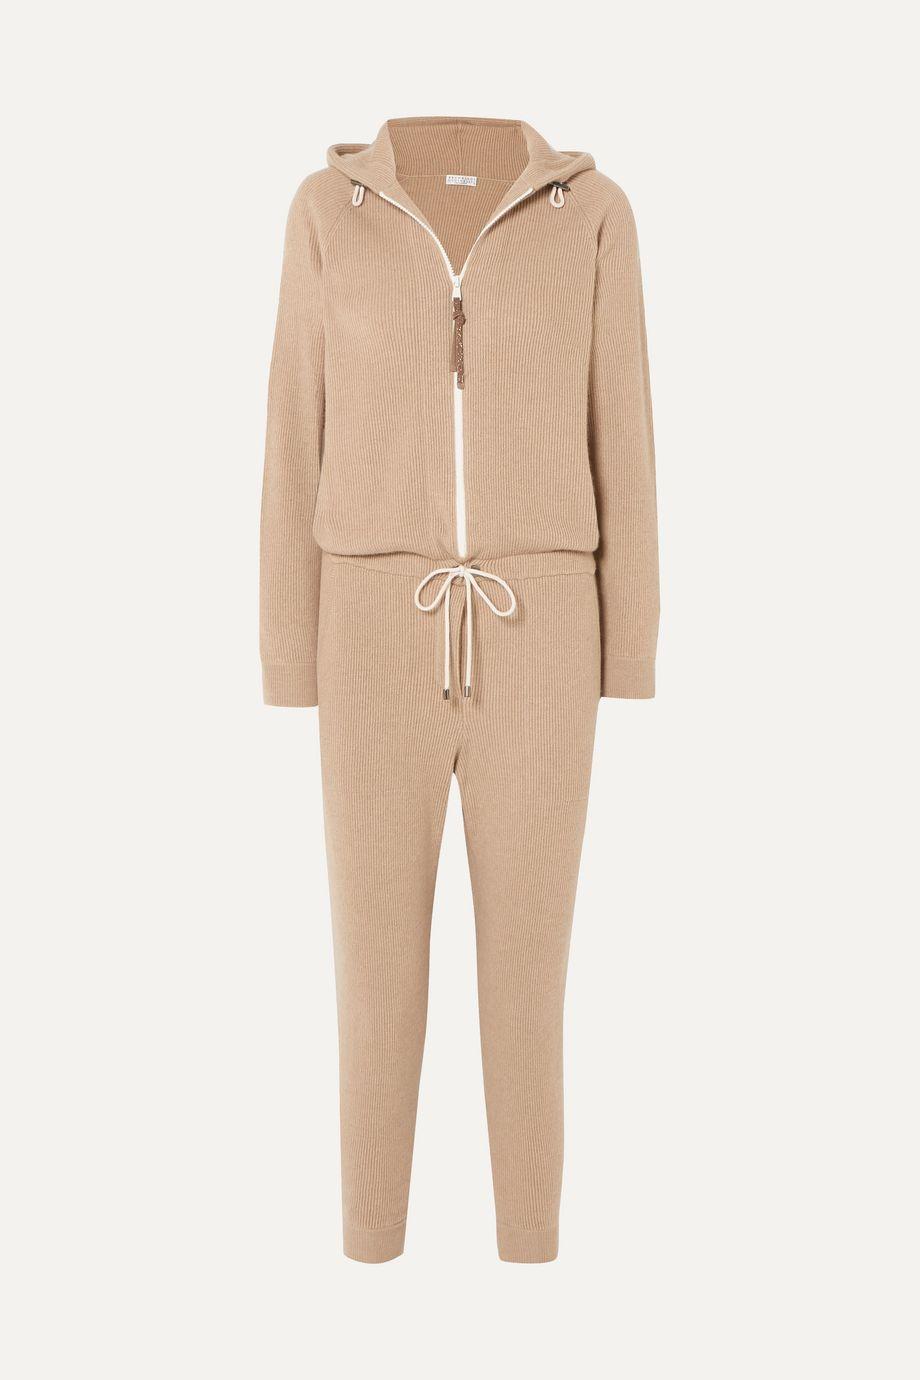 Brunello Cucinelli Bead-embellished ribbed cashmere jumpsuit